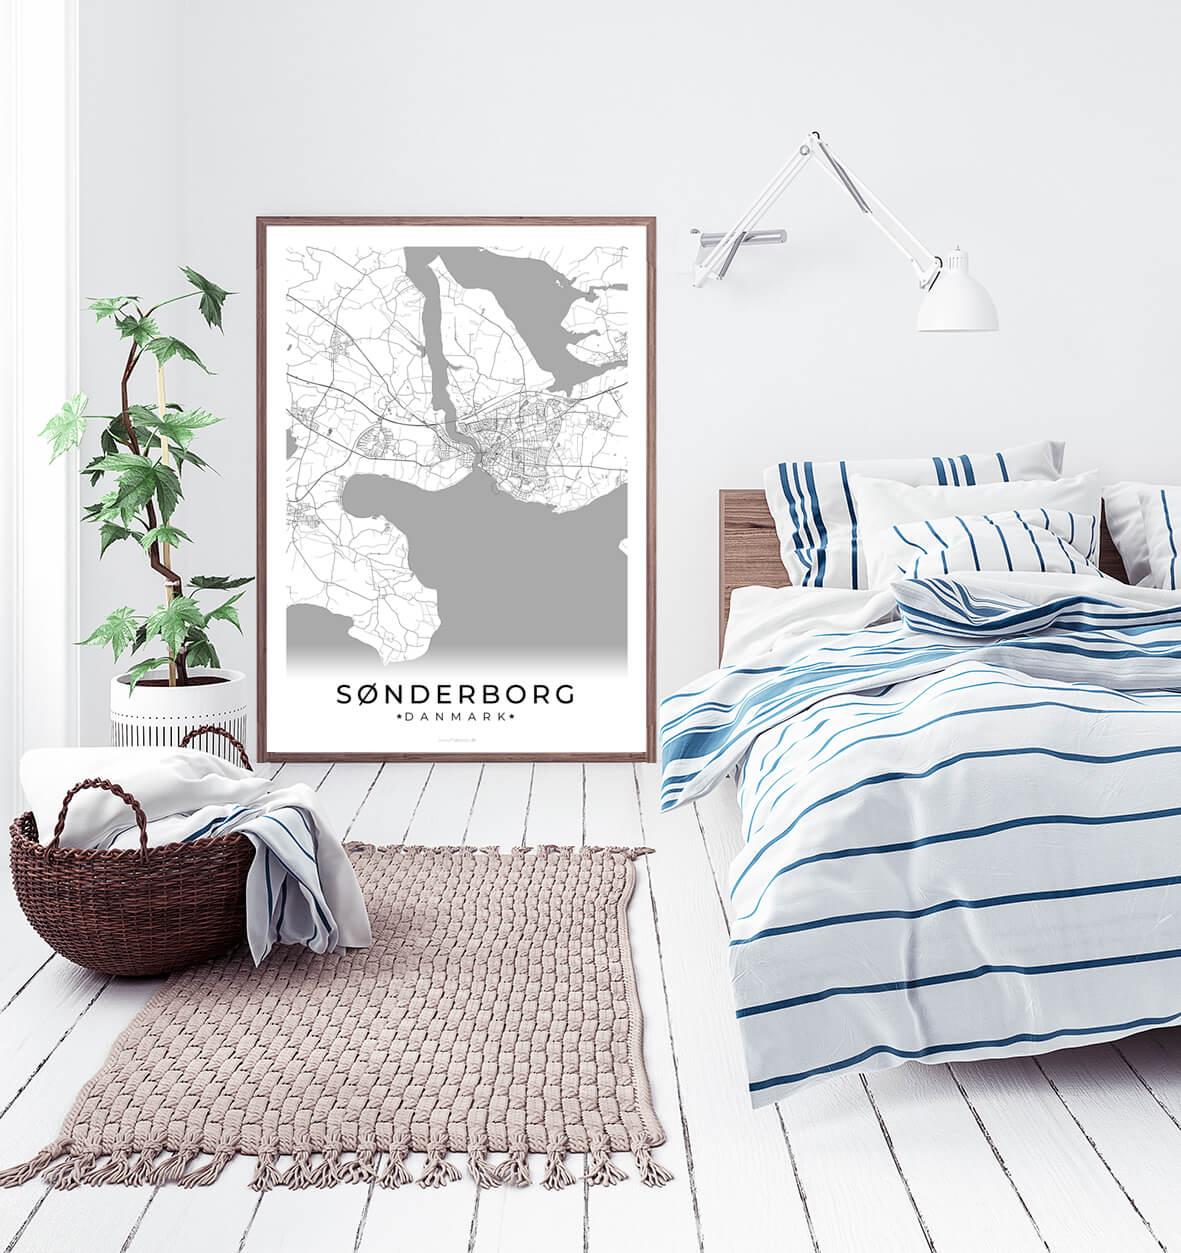 Soenderborg-hvid-byplakat-2